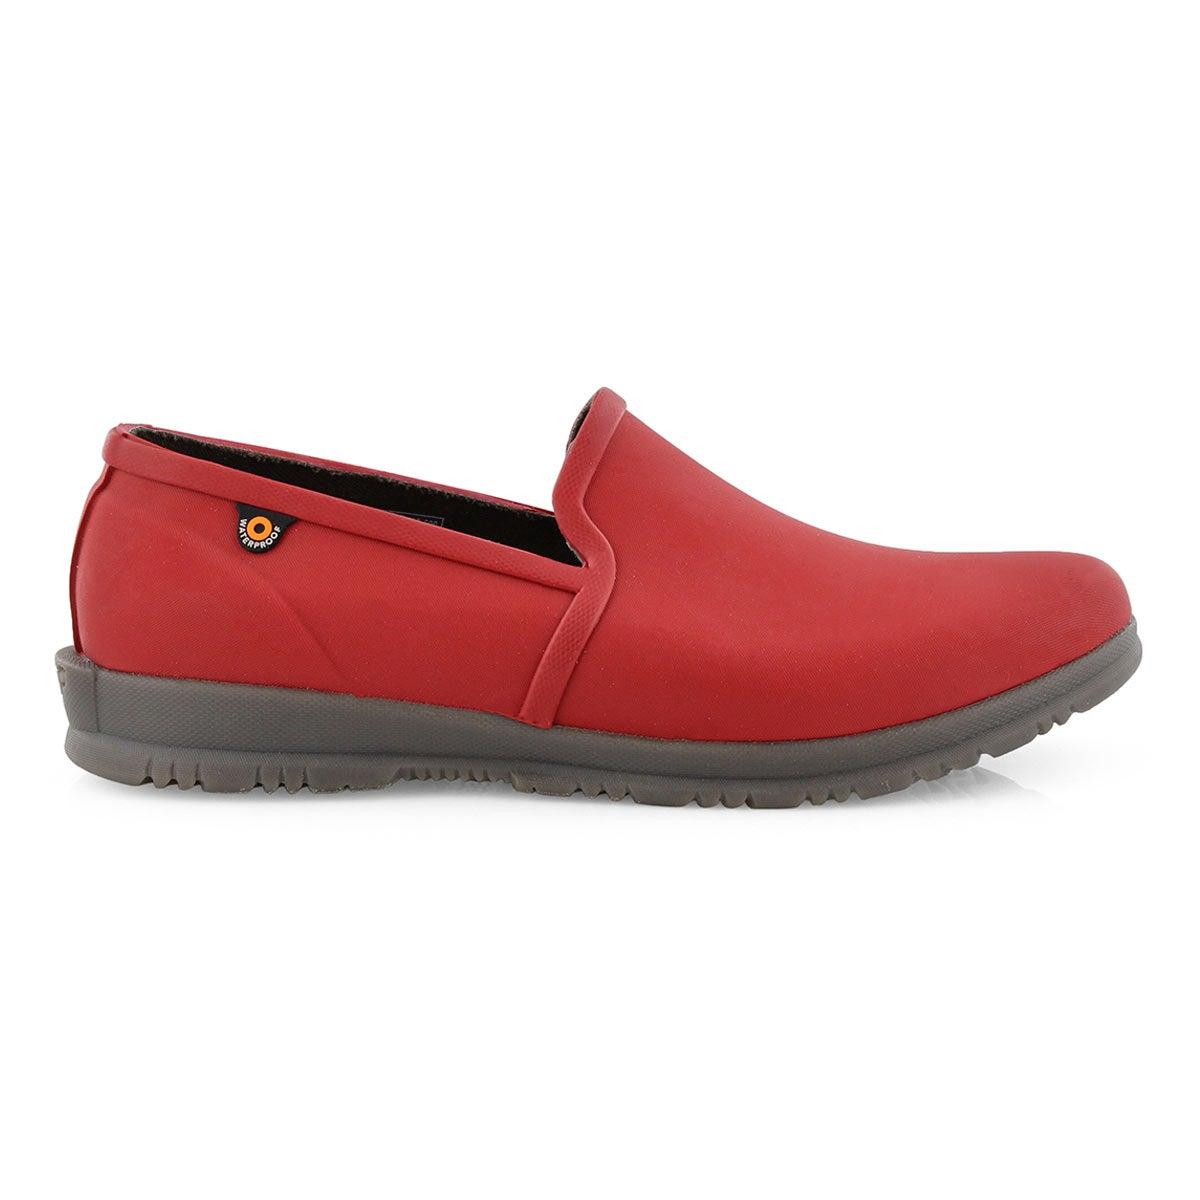 Lds Sweetpea red waterproof slip on